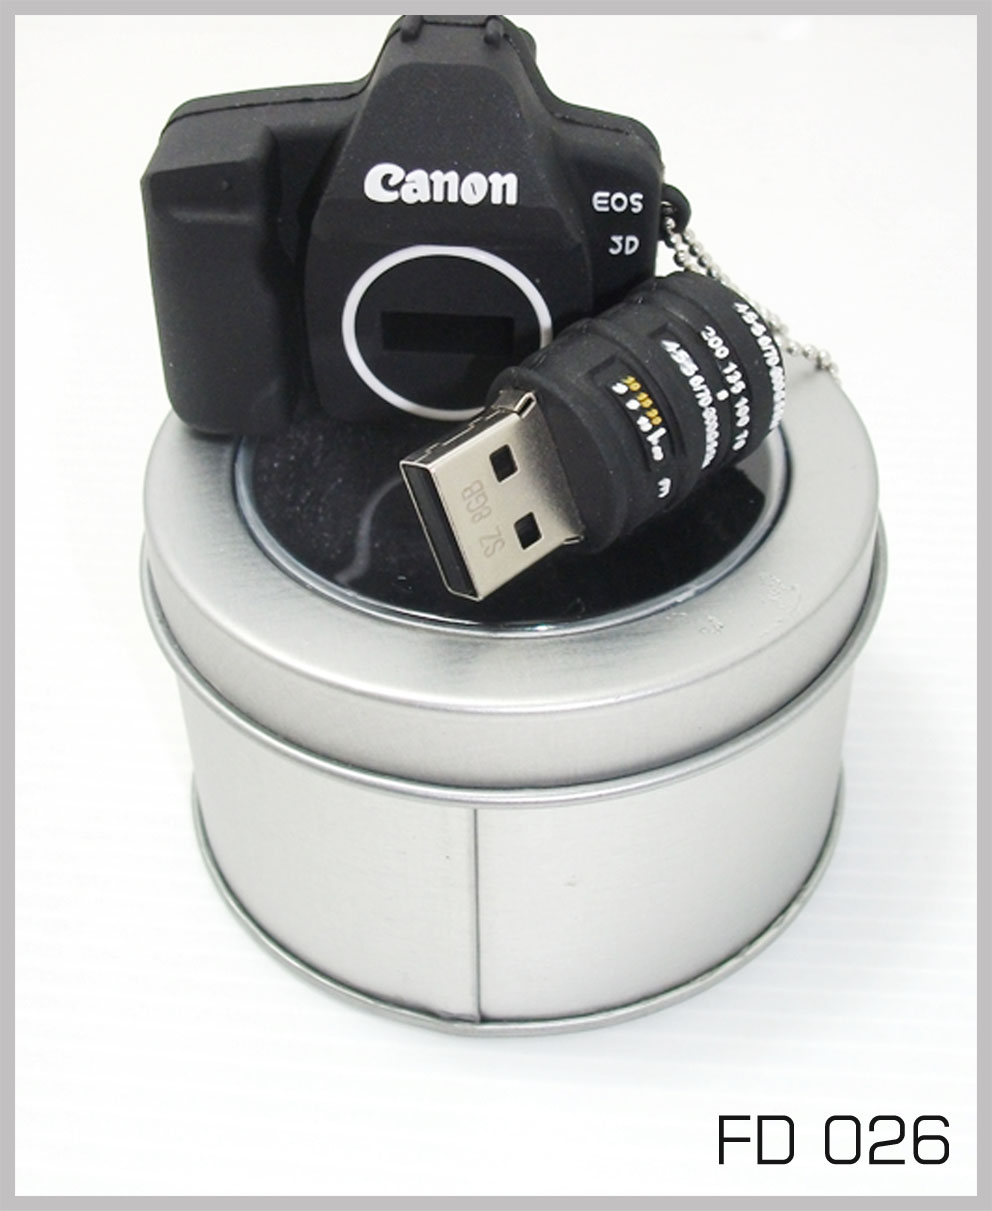 Flash Drive รูปกล้อง Canon